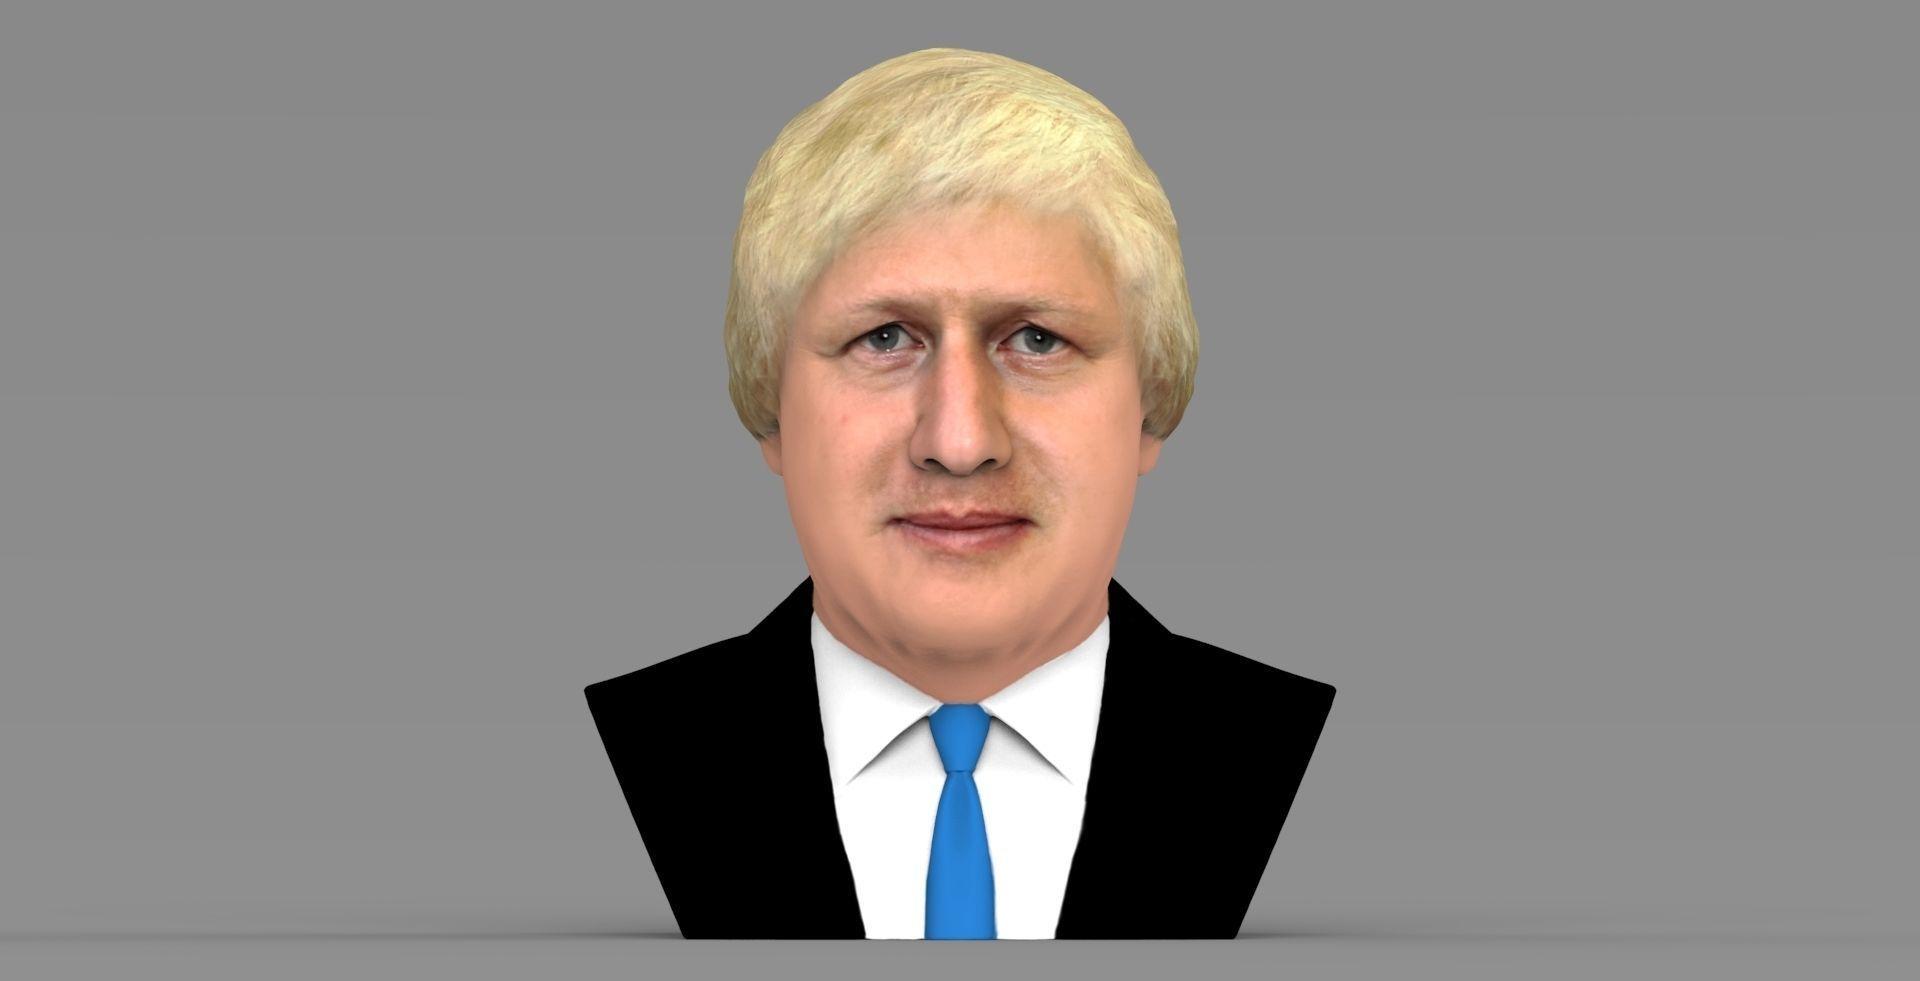 Boris Johnson bust ready for full color 3D printing